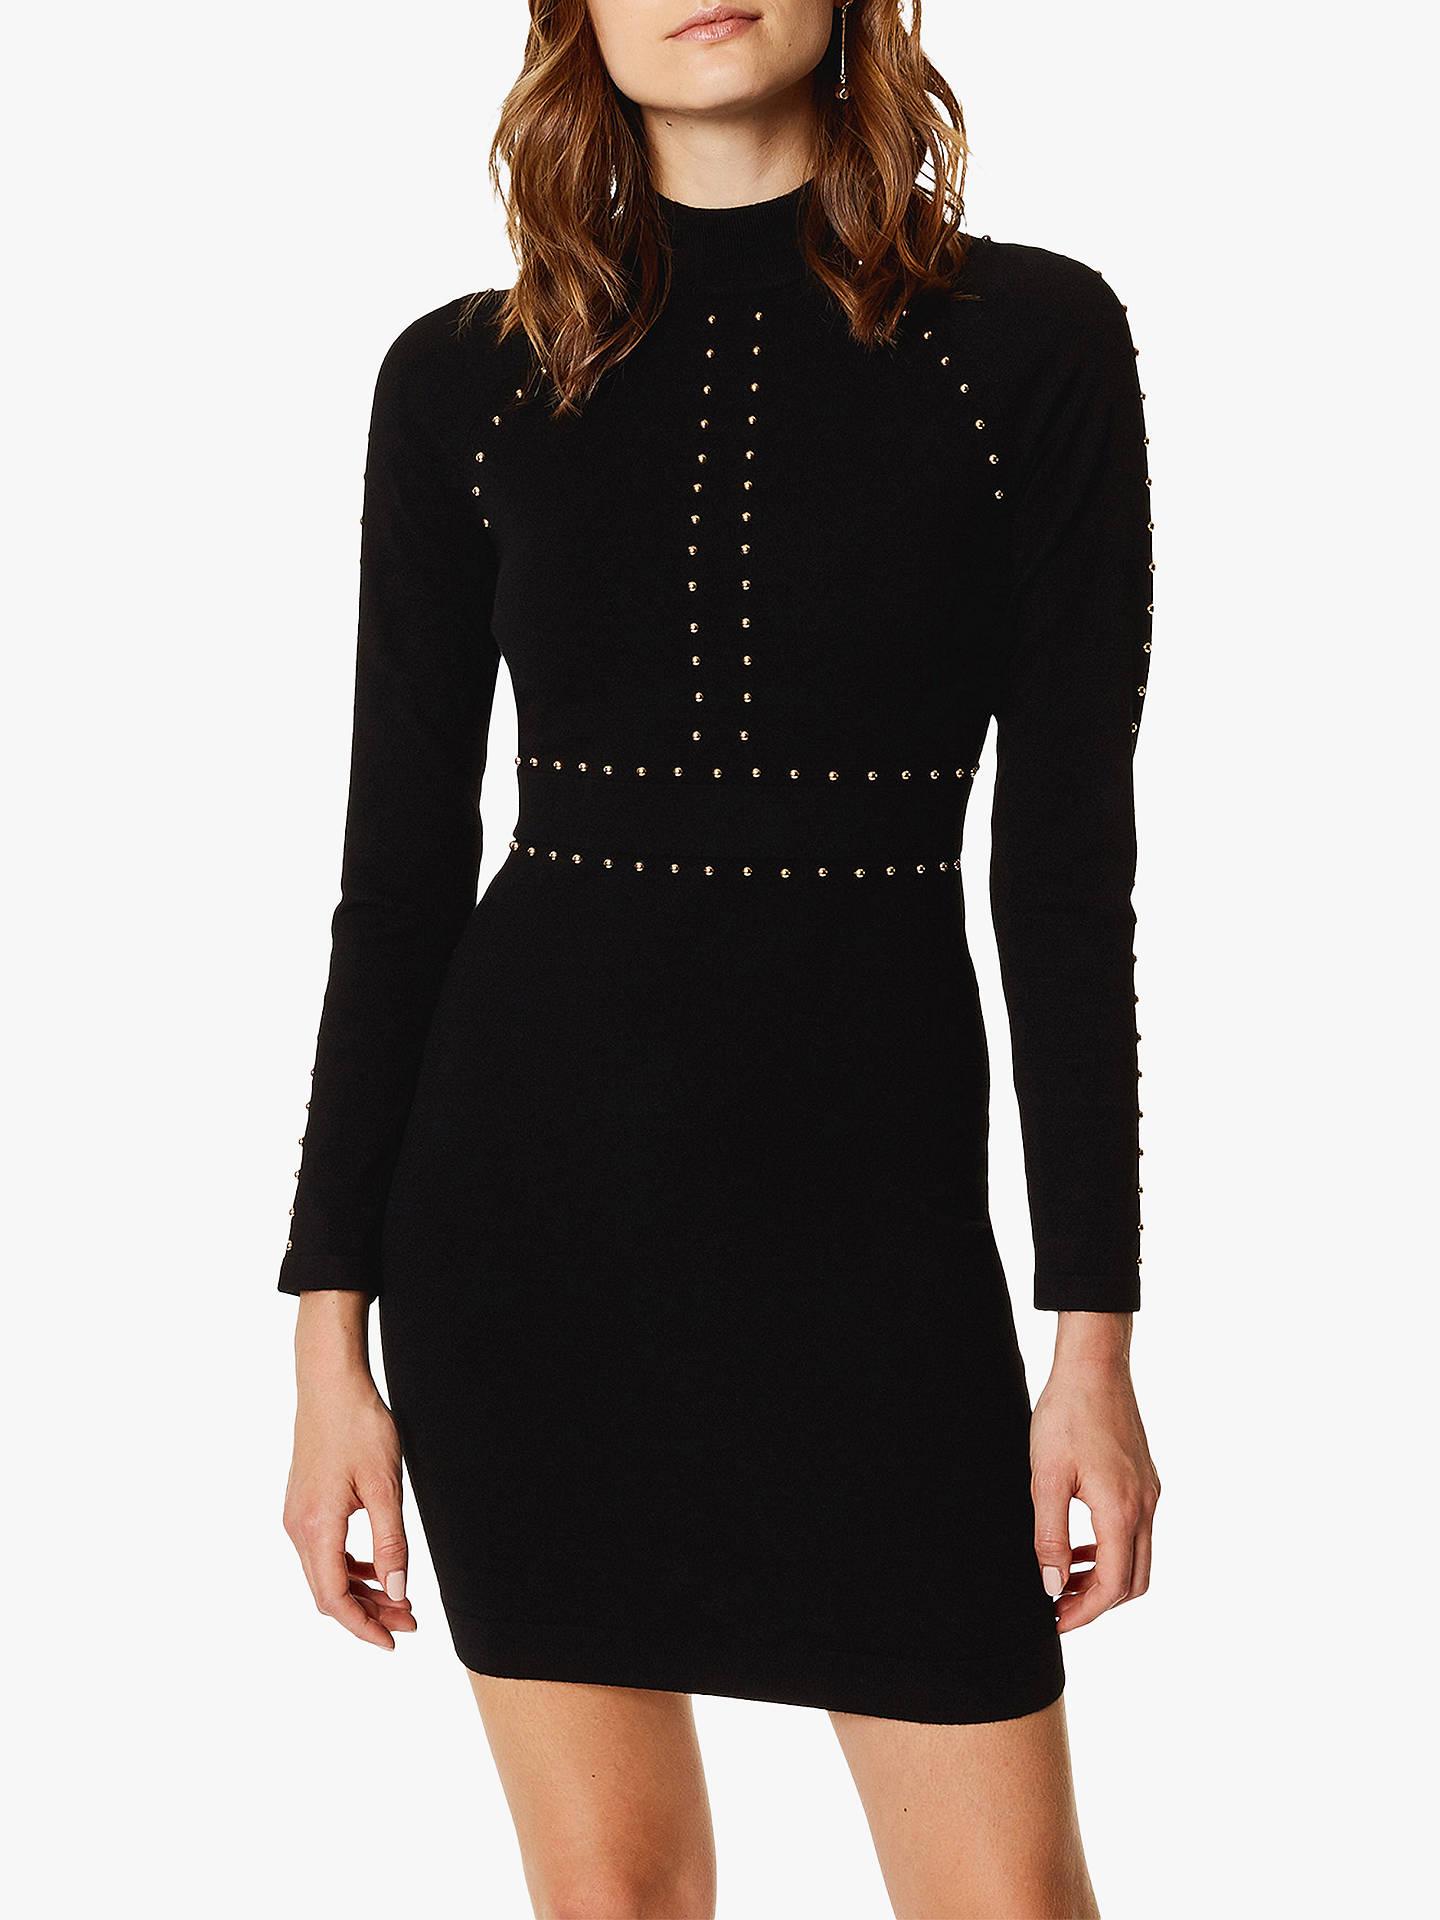 Karen millen black bodycon dress online sets